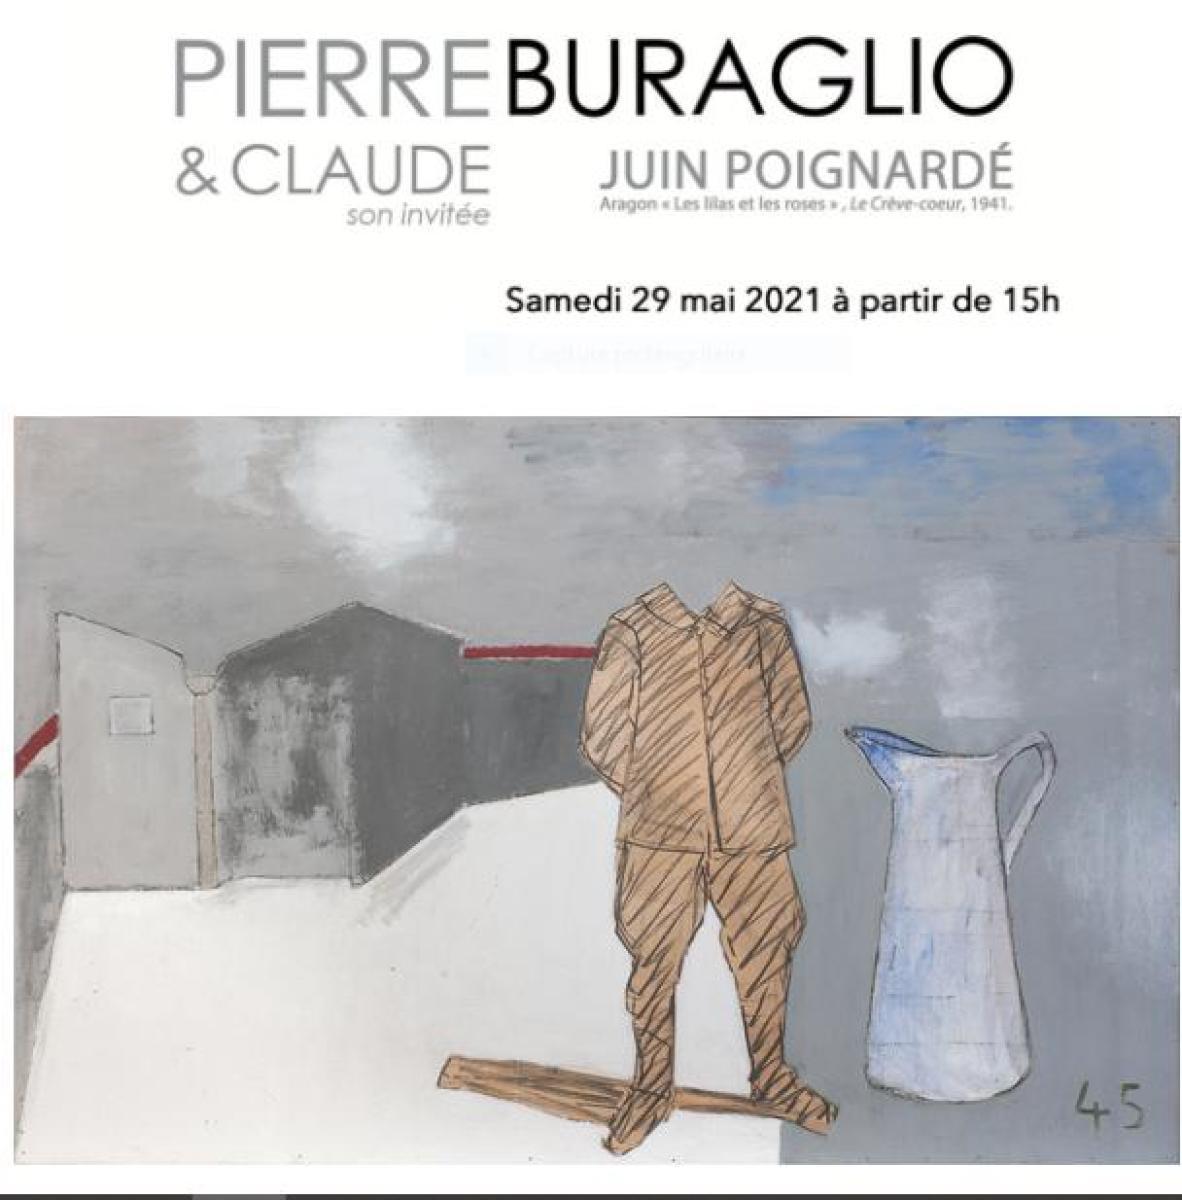 Pierre Buraglio, Juin Poignardé